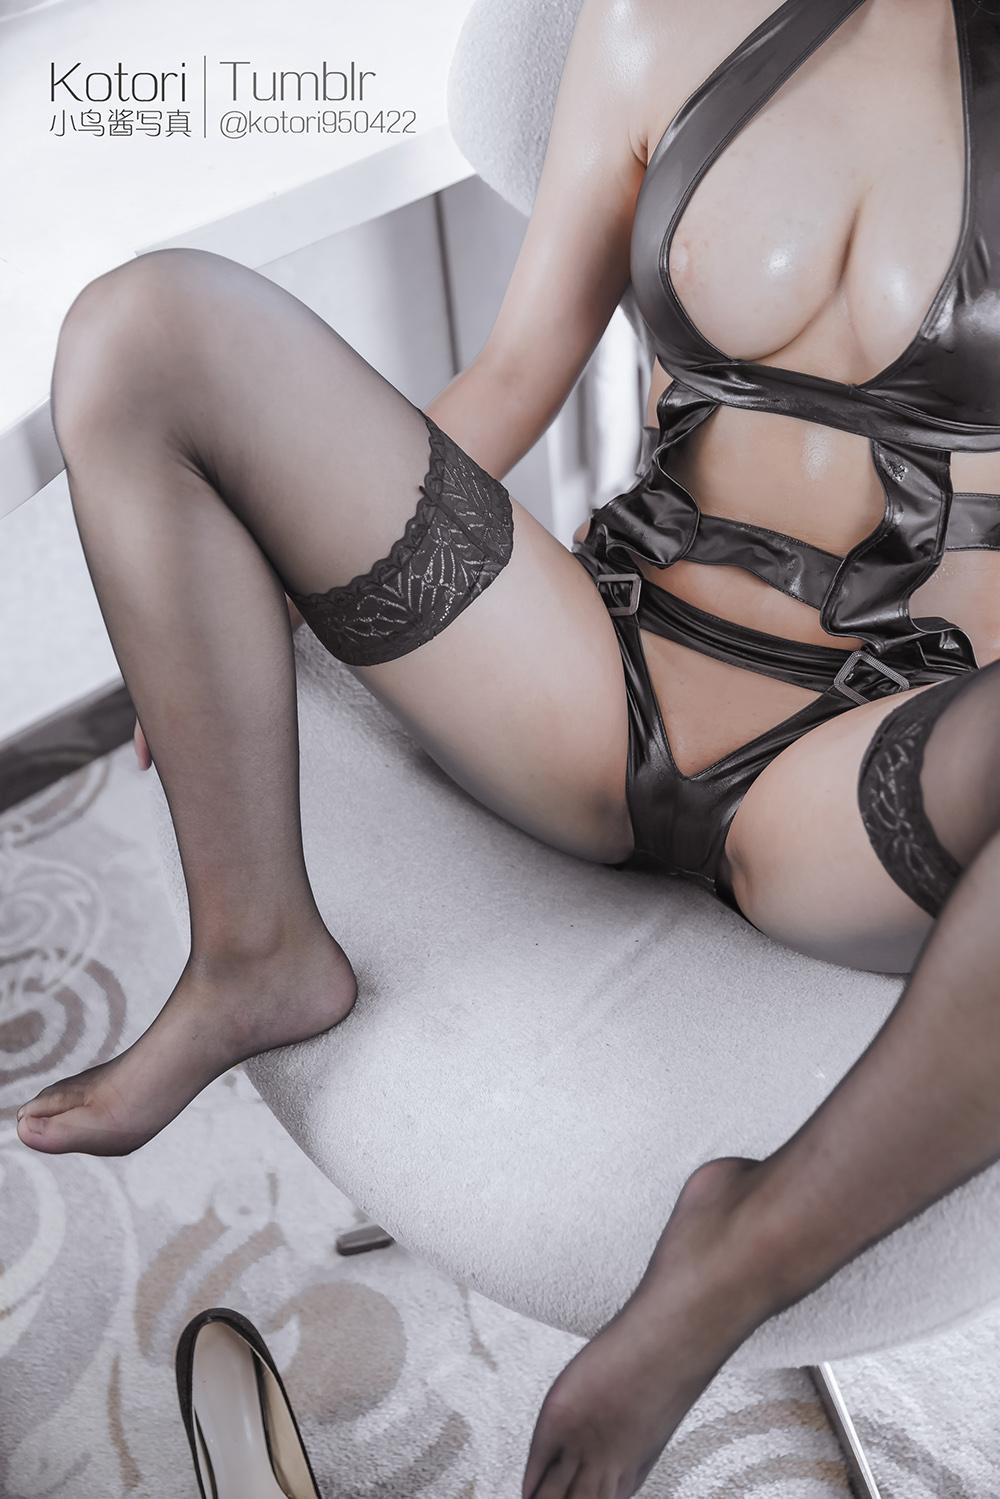 xK4ogj - Cosplay girl PR社 福利姬 小鸟酱系列–黑色束缚衣